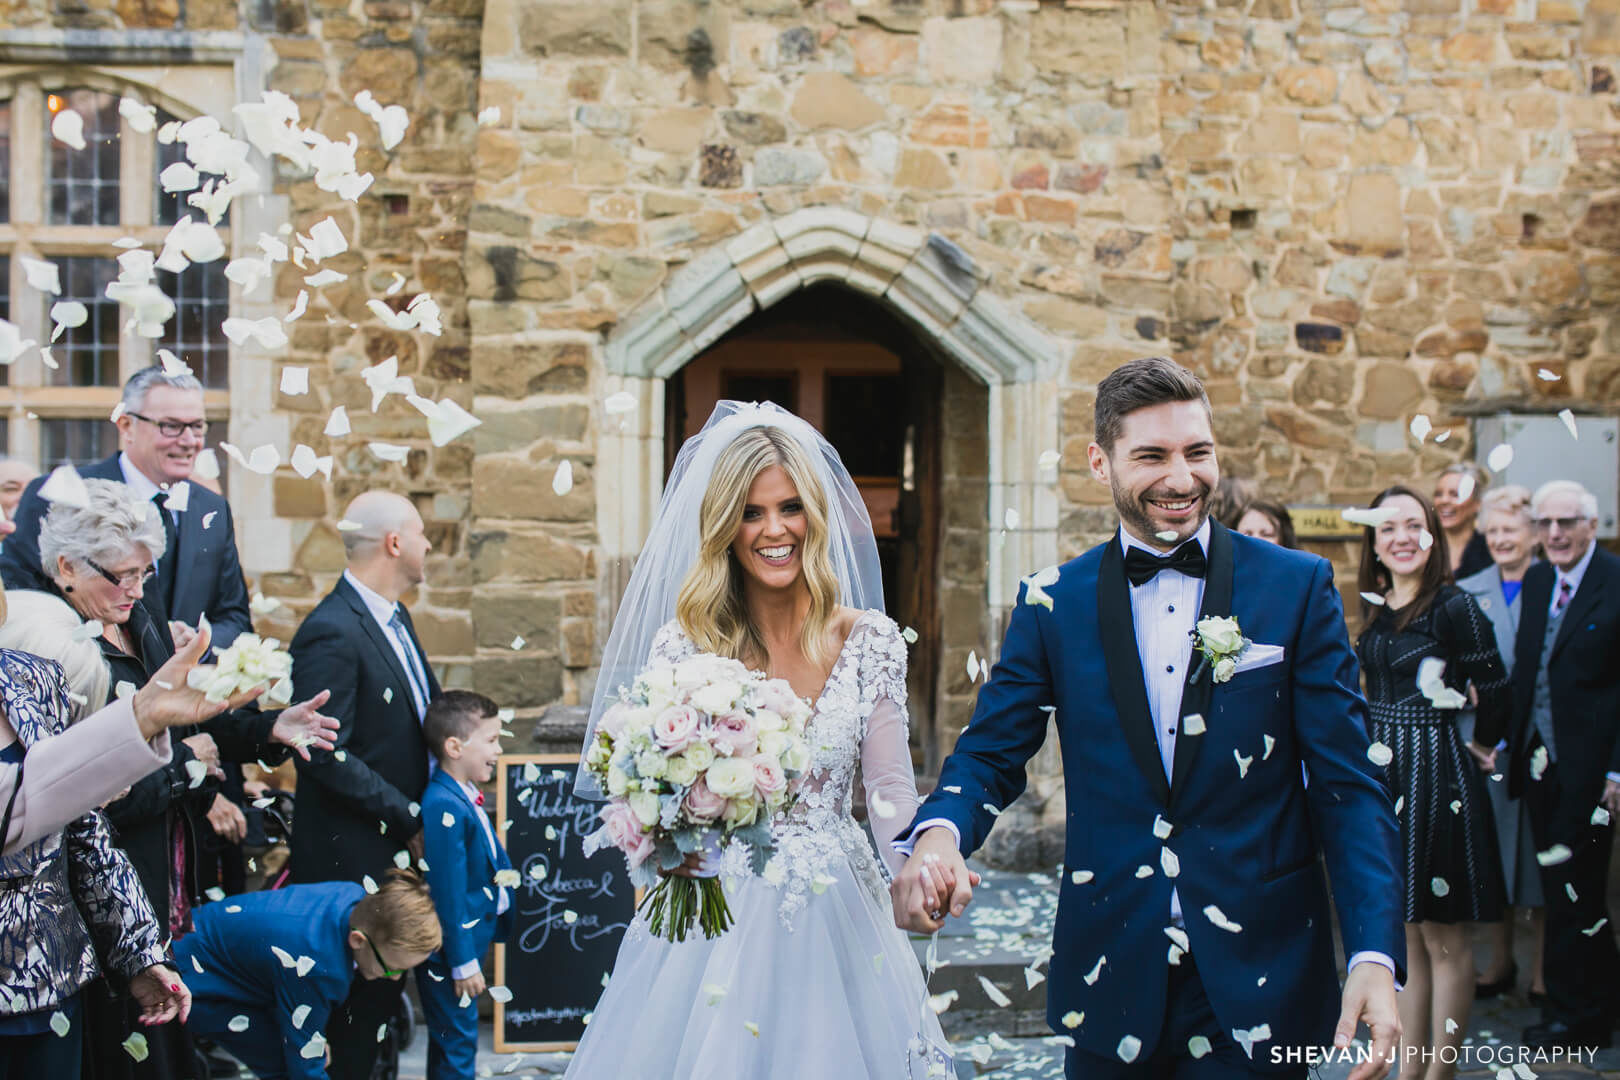 Monsalvat Wedding | Bec + Josh - Shevan J Photography